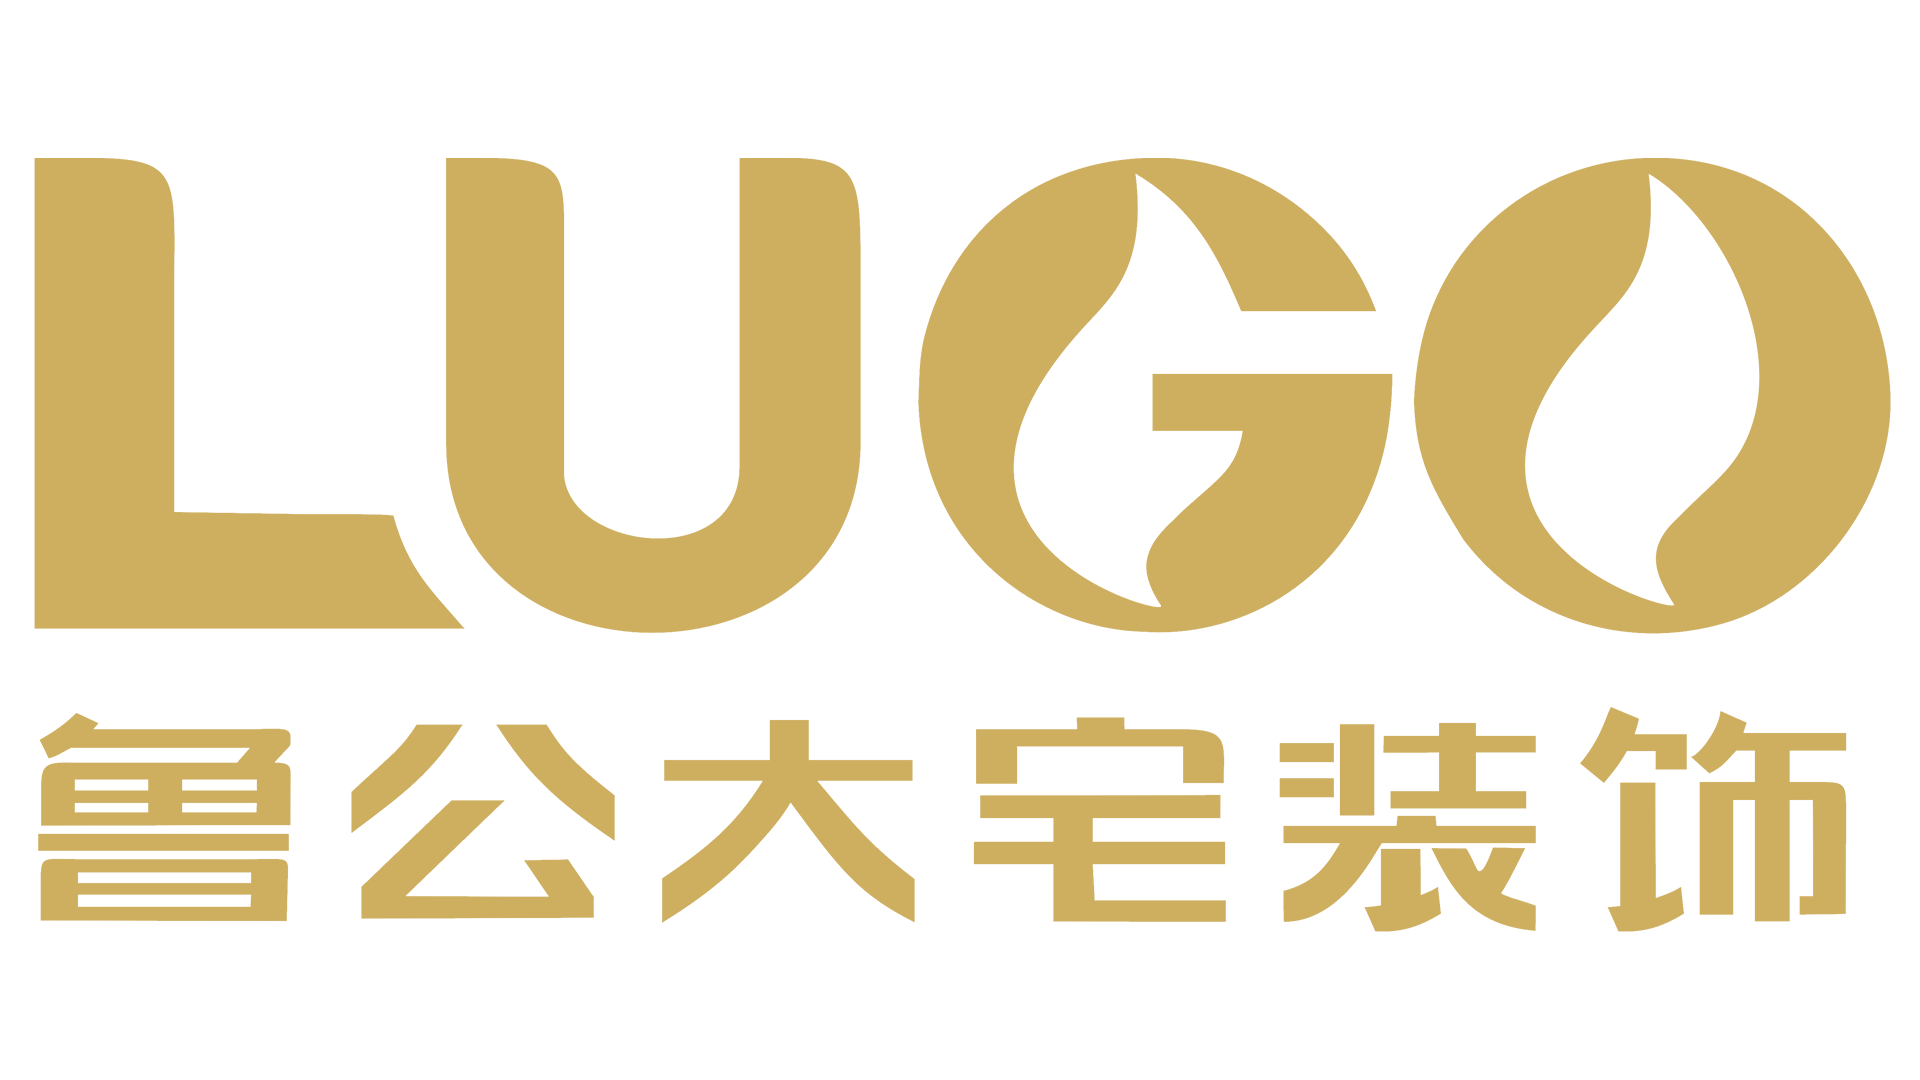 鲁公大宅LOGO2.png